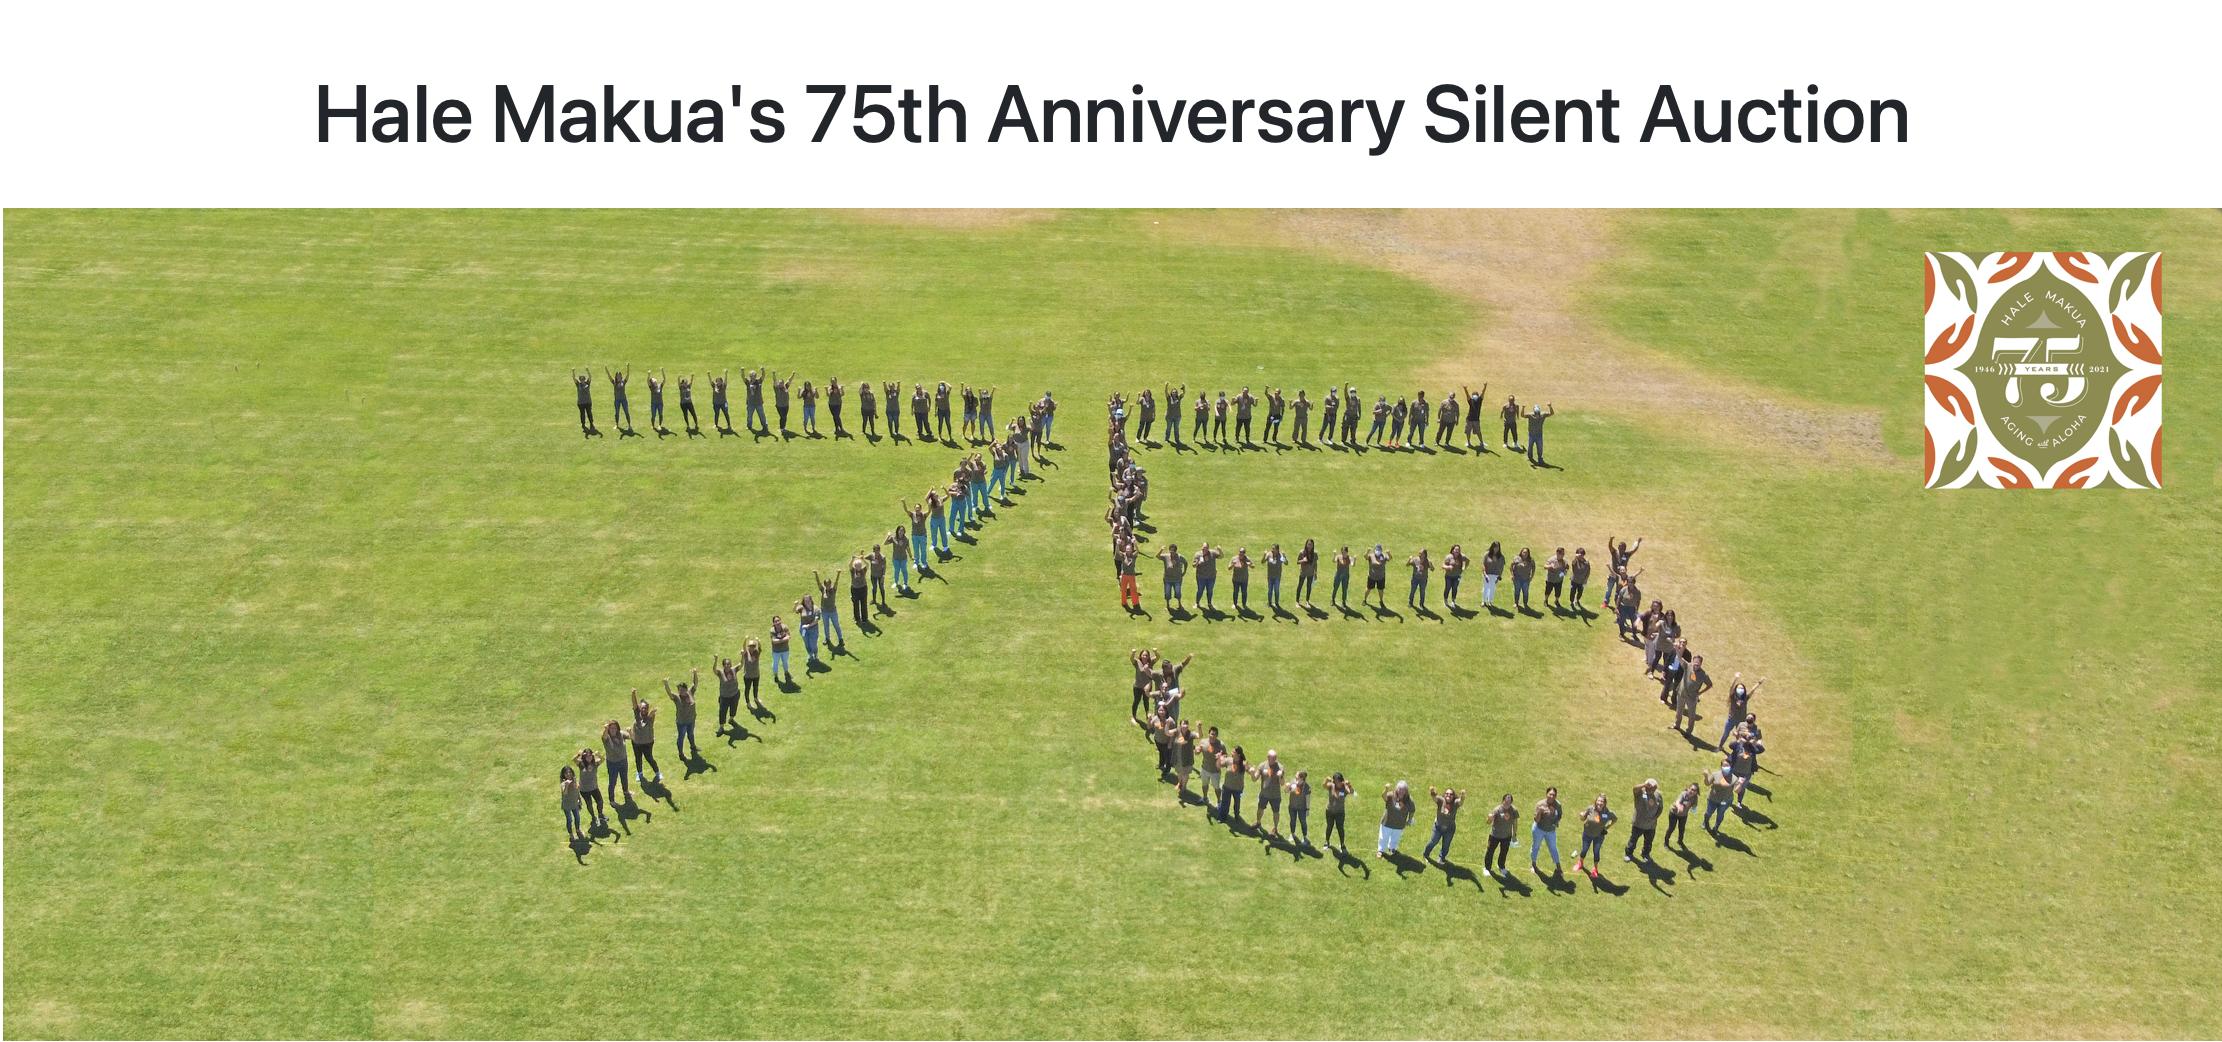 Hale Makua's 75th Anniversary Golf Tournament Silent Auction Open for Bids